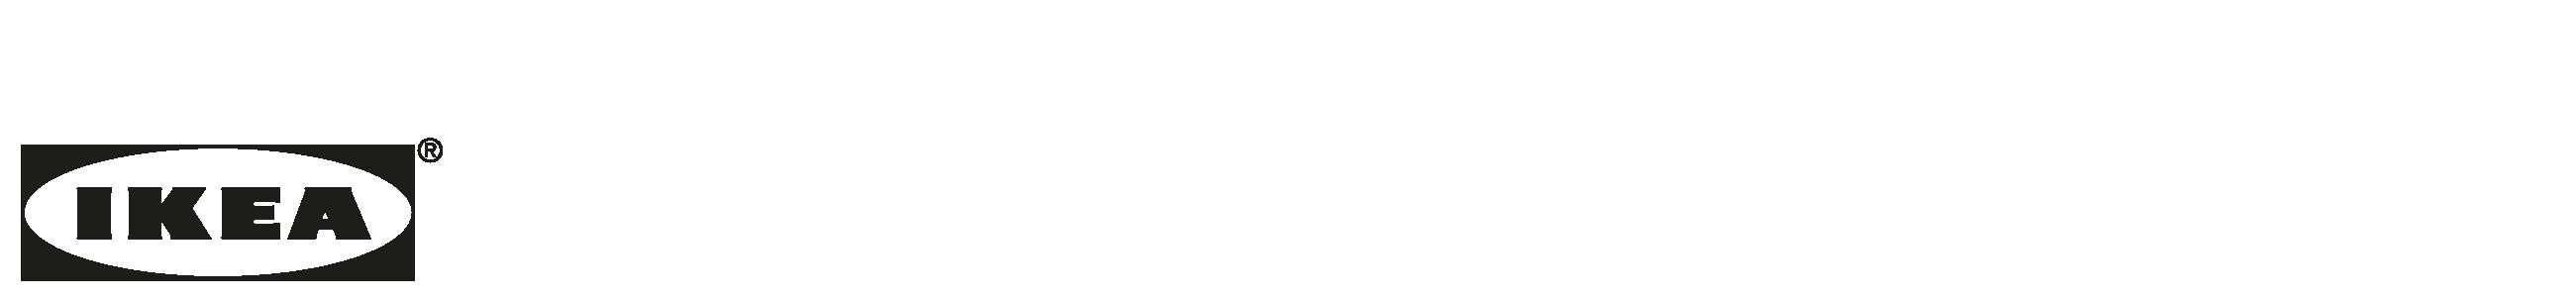 MADHOUSE – WEB_V3_ERAE UNA VEZ – CLIENTES